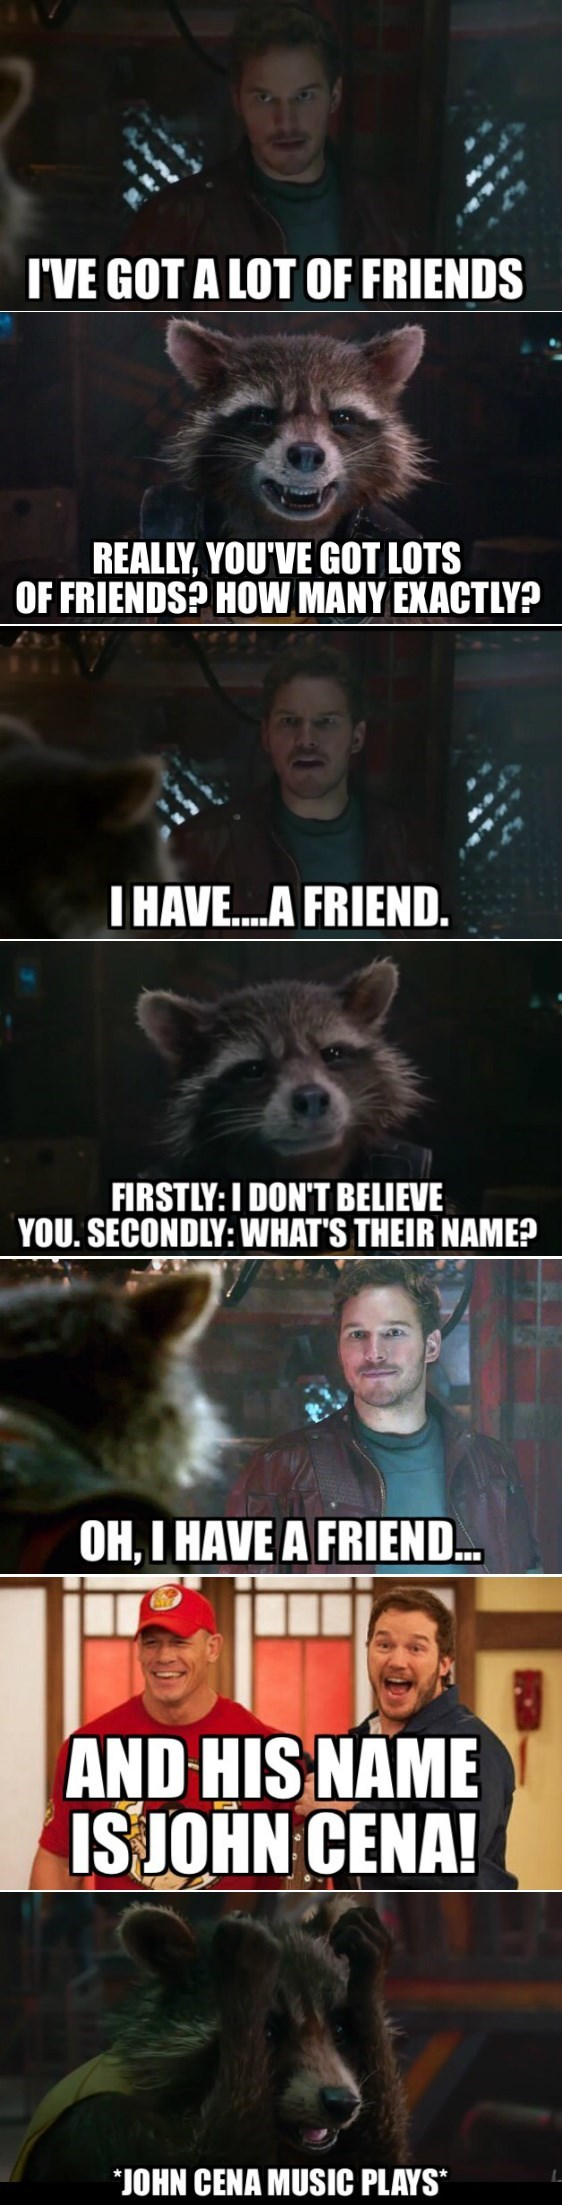 superheroes-guardians-of-the-galaxy-marvel-john-cena-meme